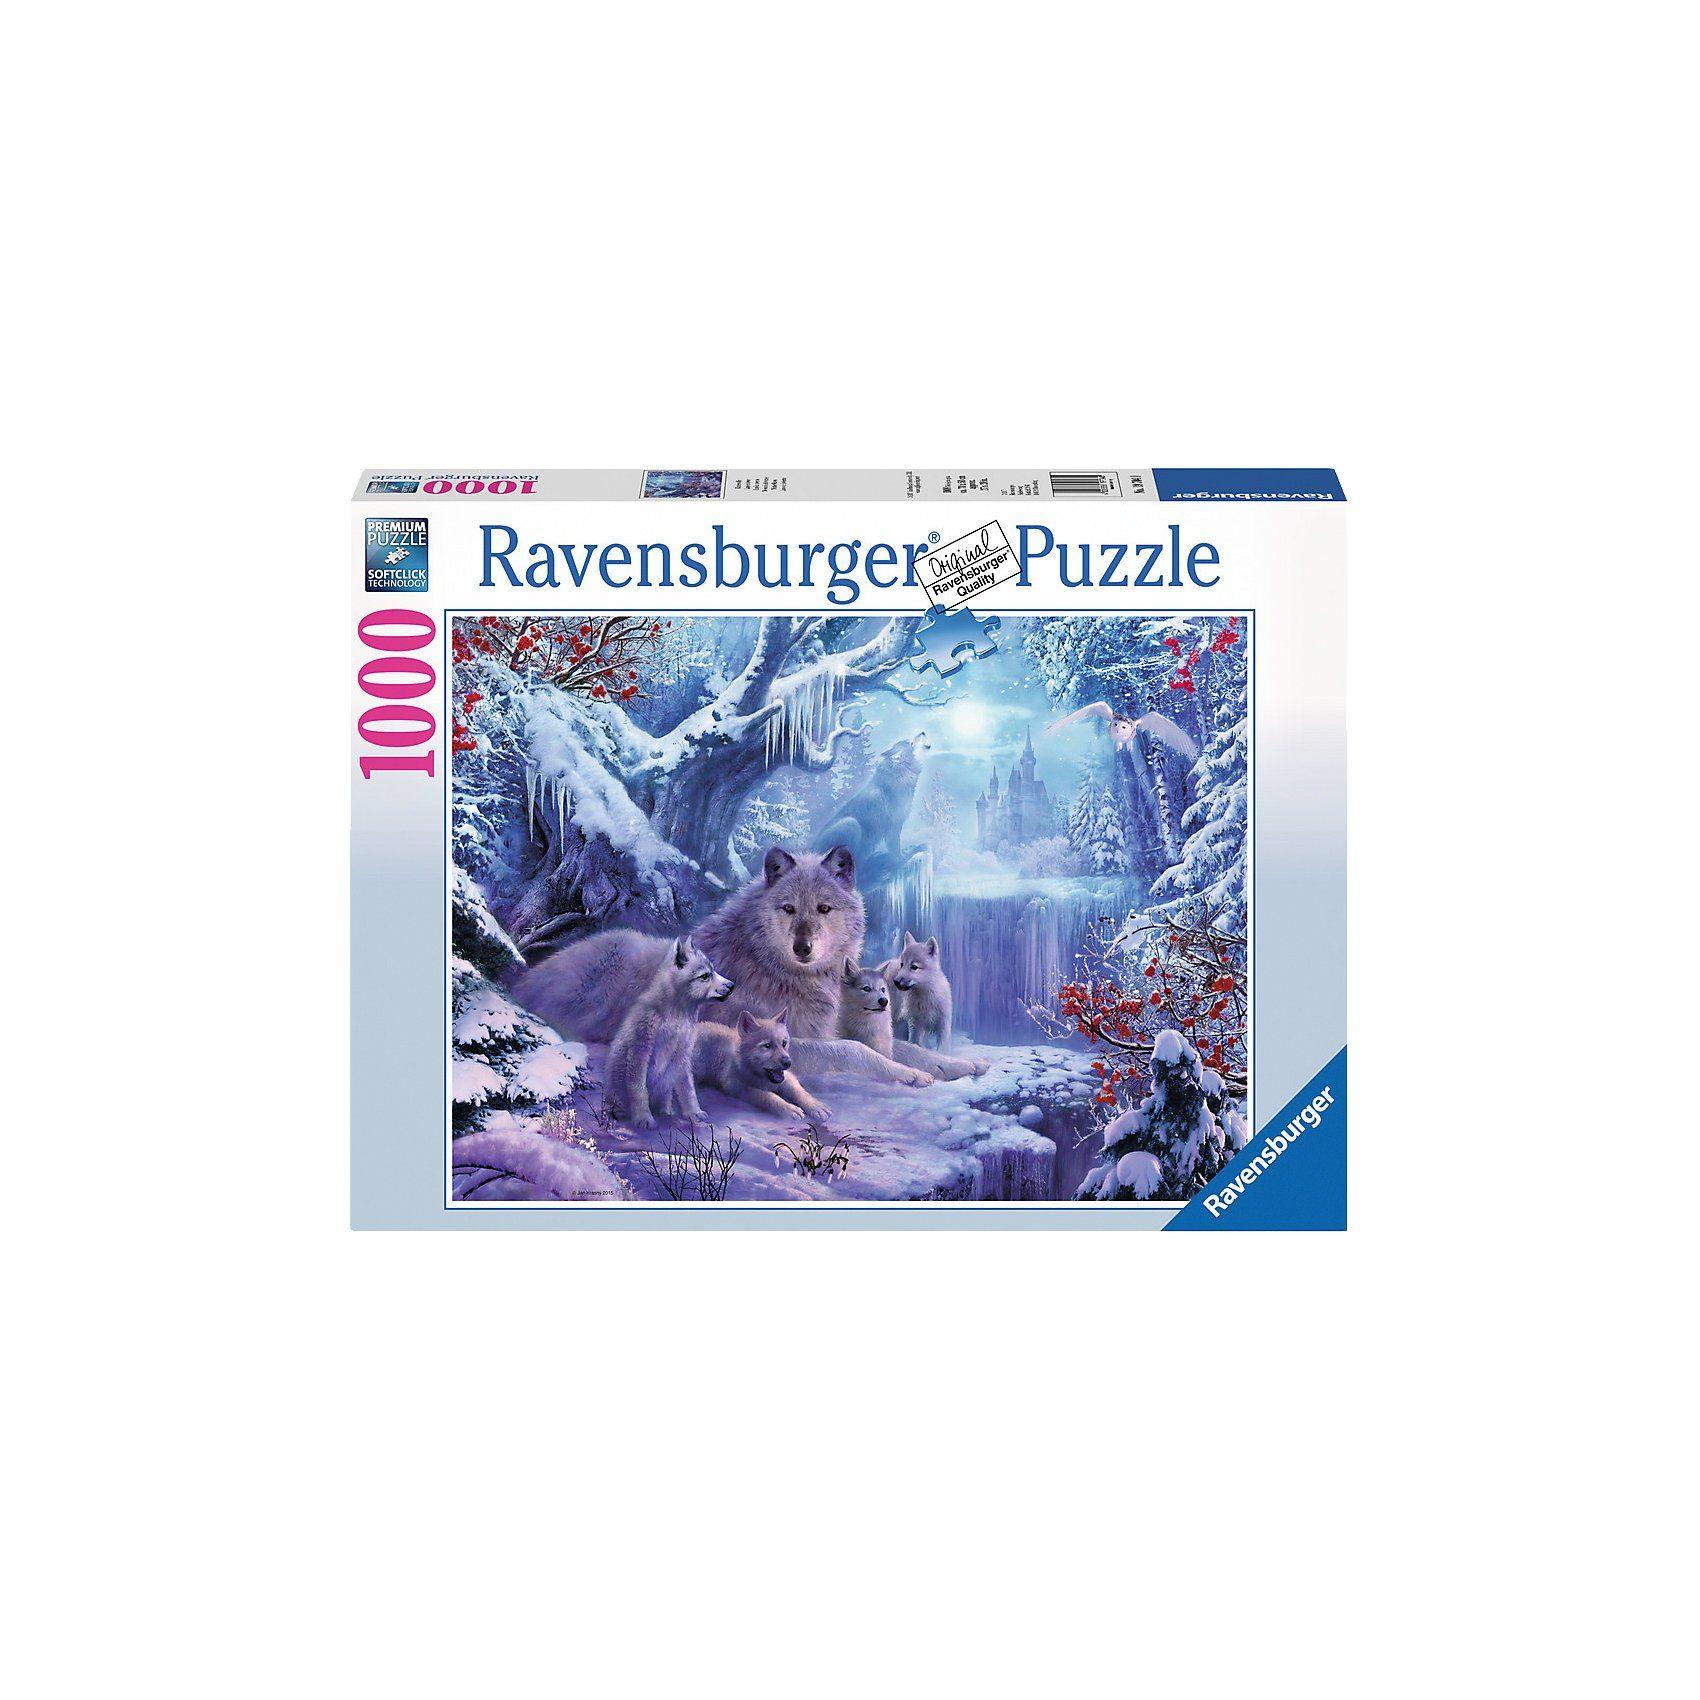 Ravensburger Winterwölfe 1000 Teile Puzzle